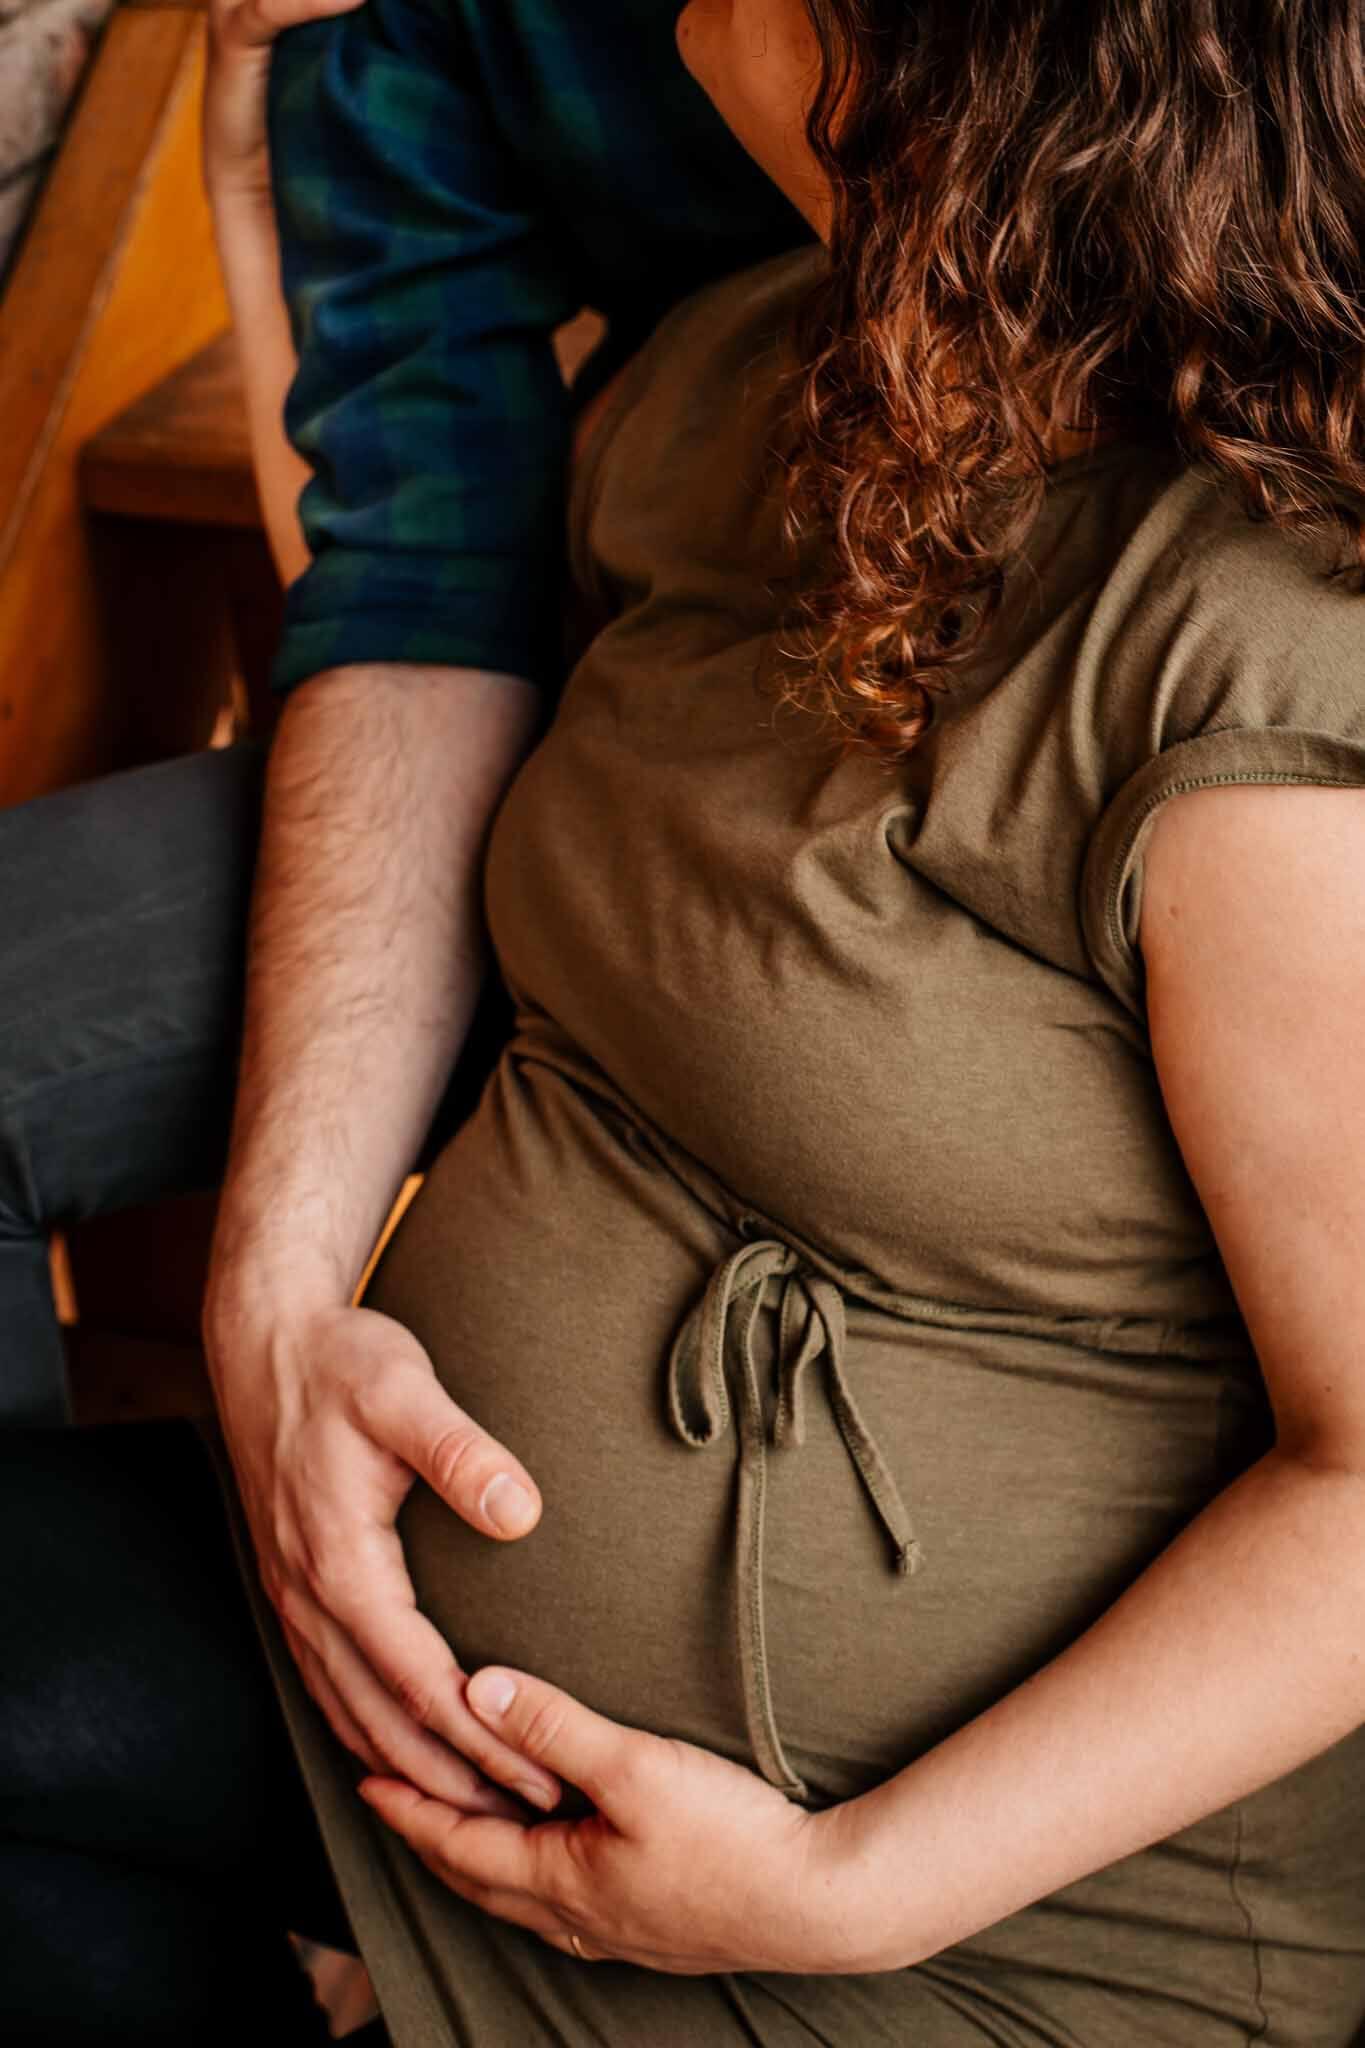 Mann mit schwangerer Frau